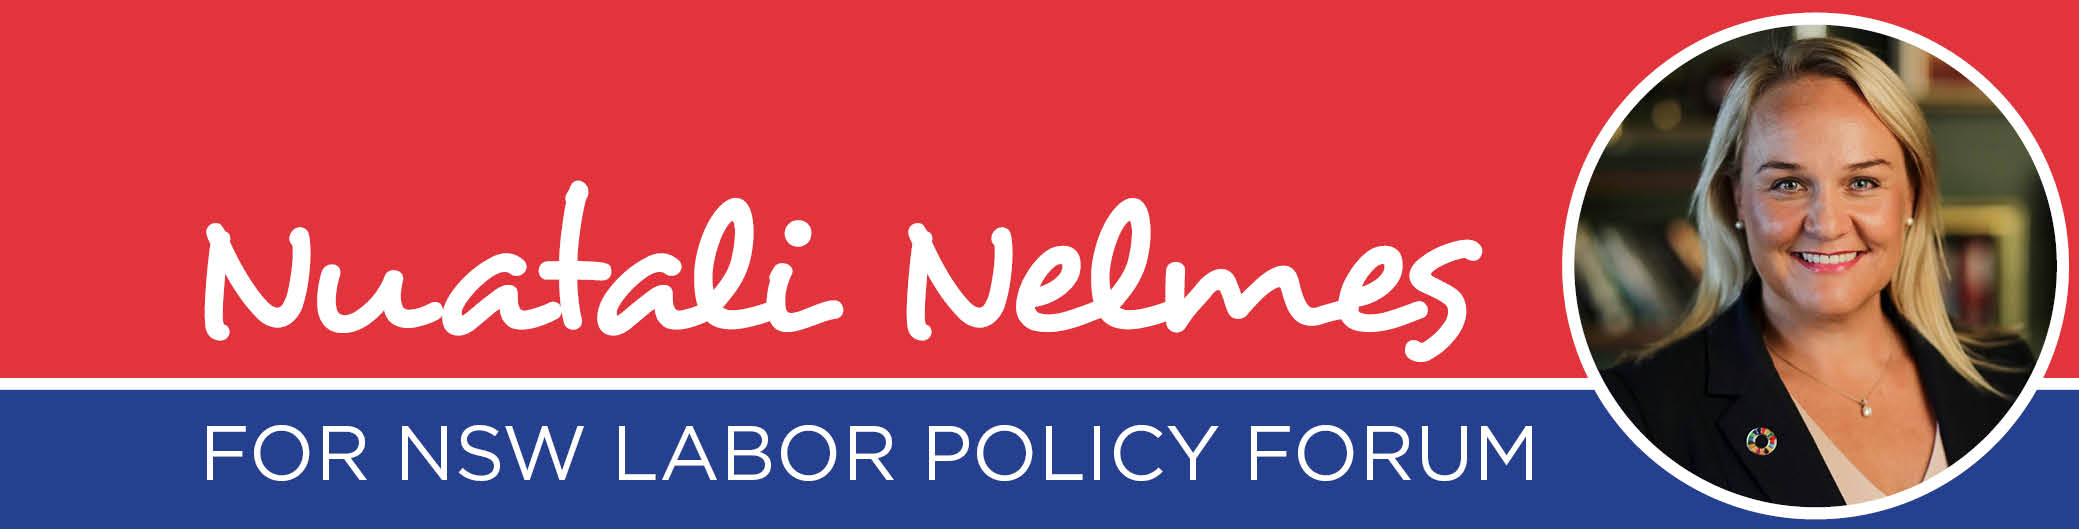 Policy_Forum_banner1.jpg